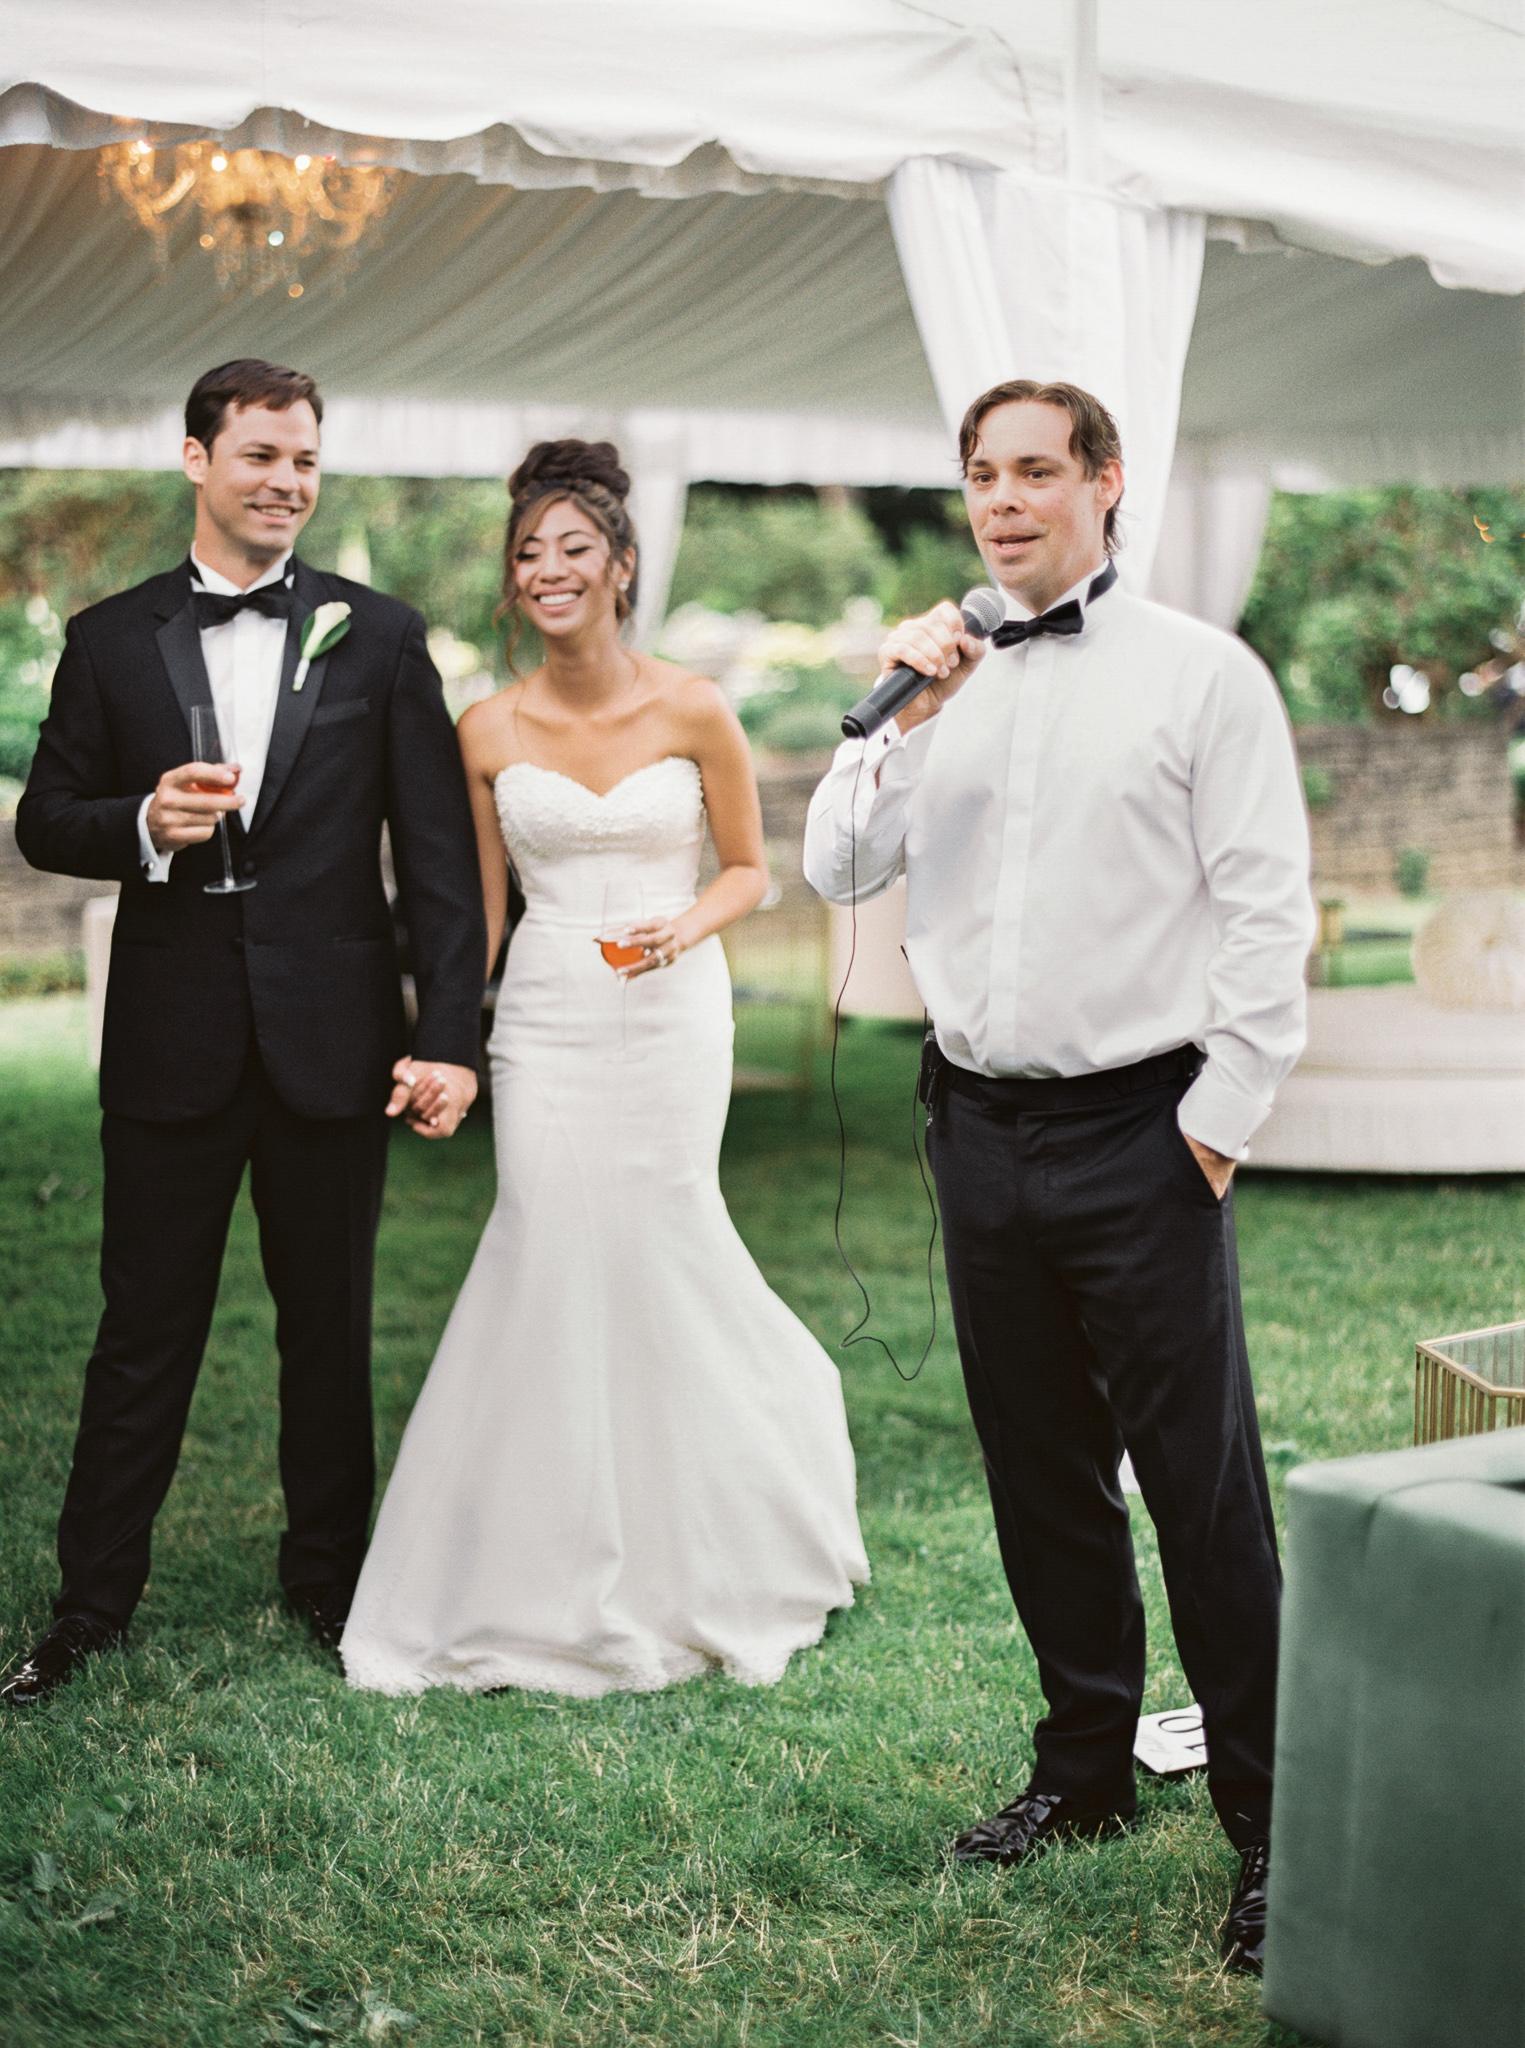 205OutliveCreative_Travel_Photographer_Videographer_Lewis&Clark_Oregon_Elegant_BlackTie_Destination_Wedding.jpg